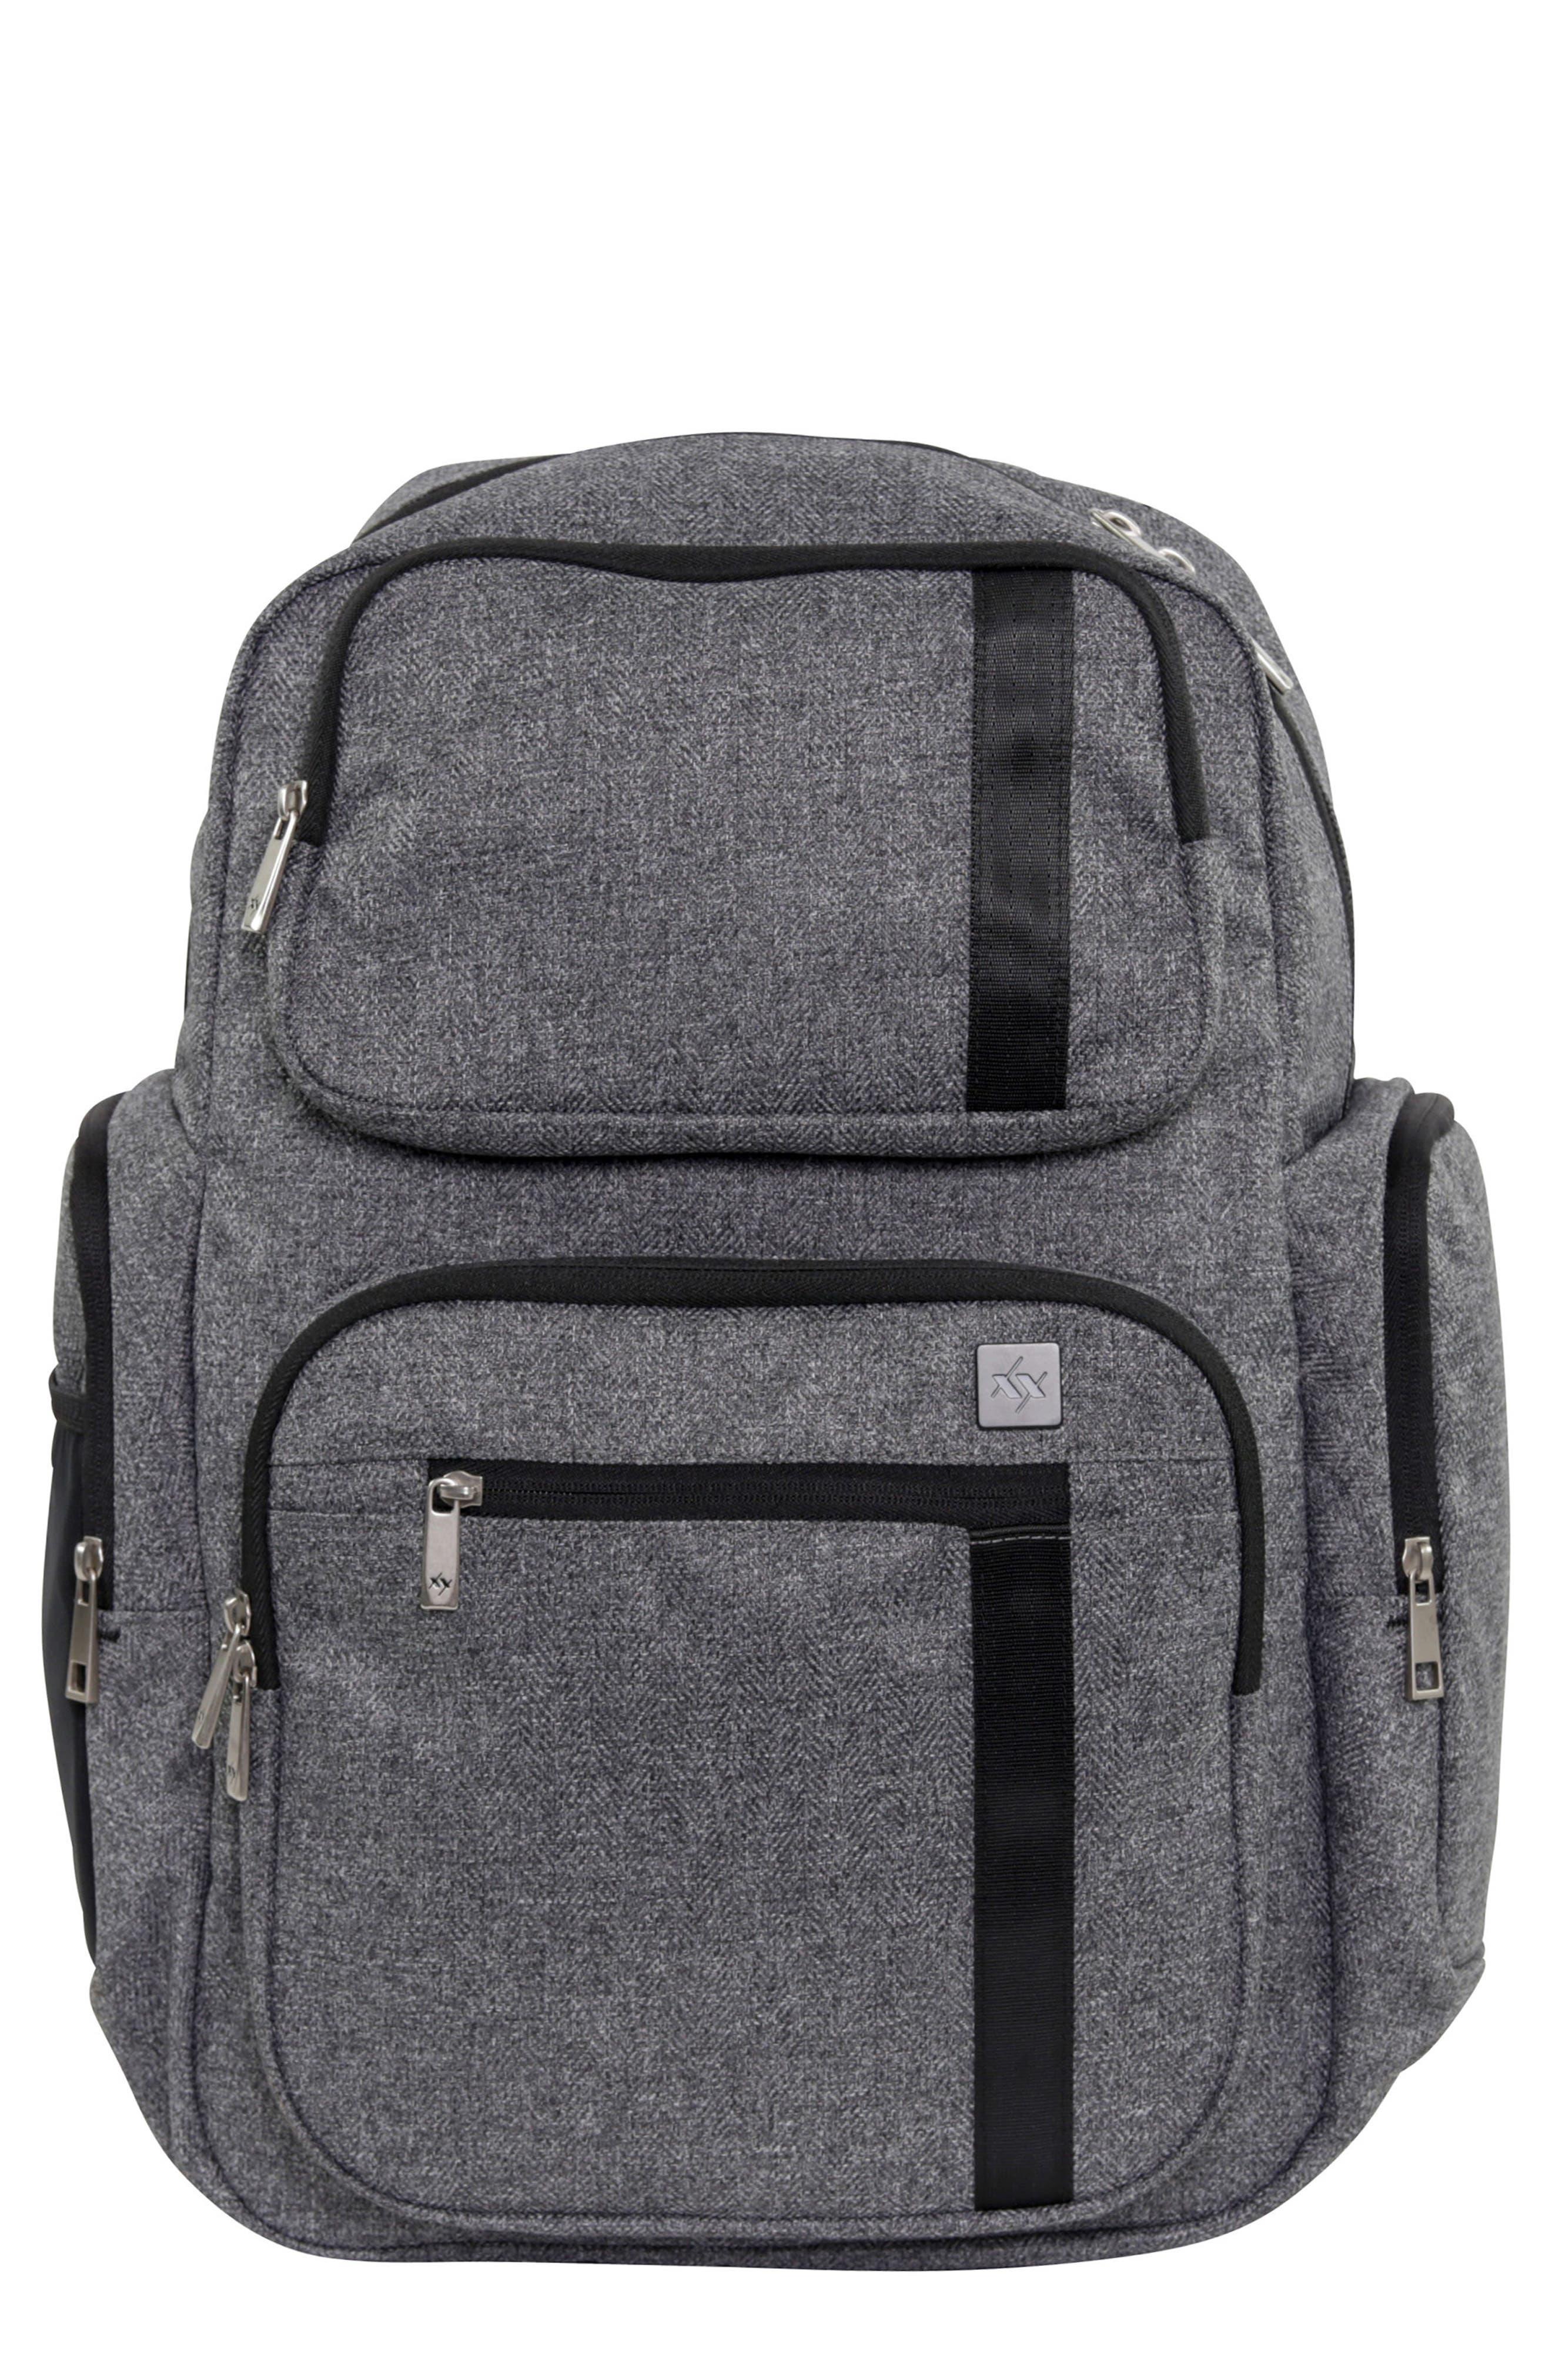 Ju-Ju-Be XY Vector Diaper Backpack